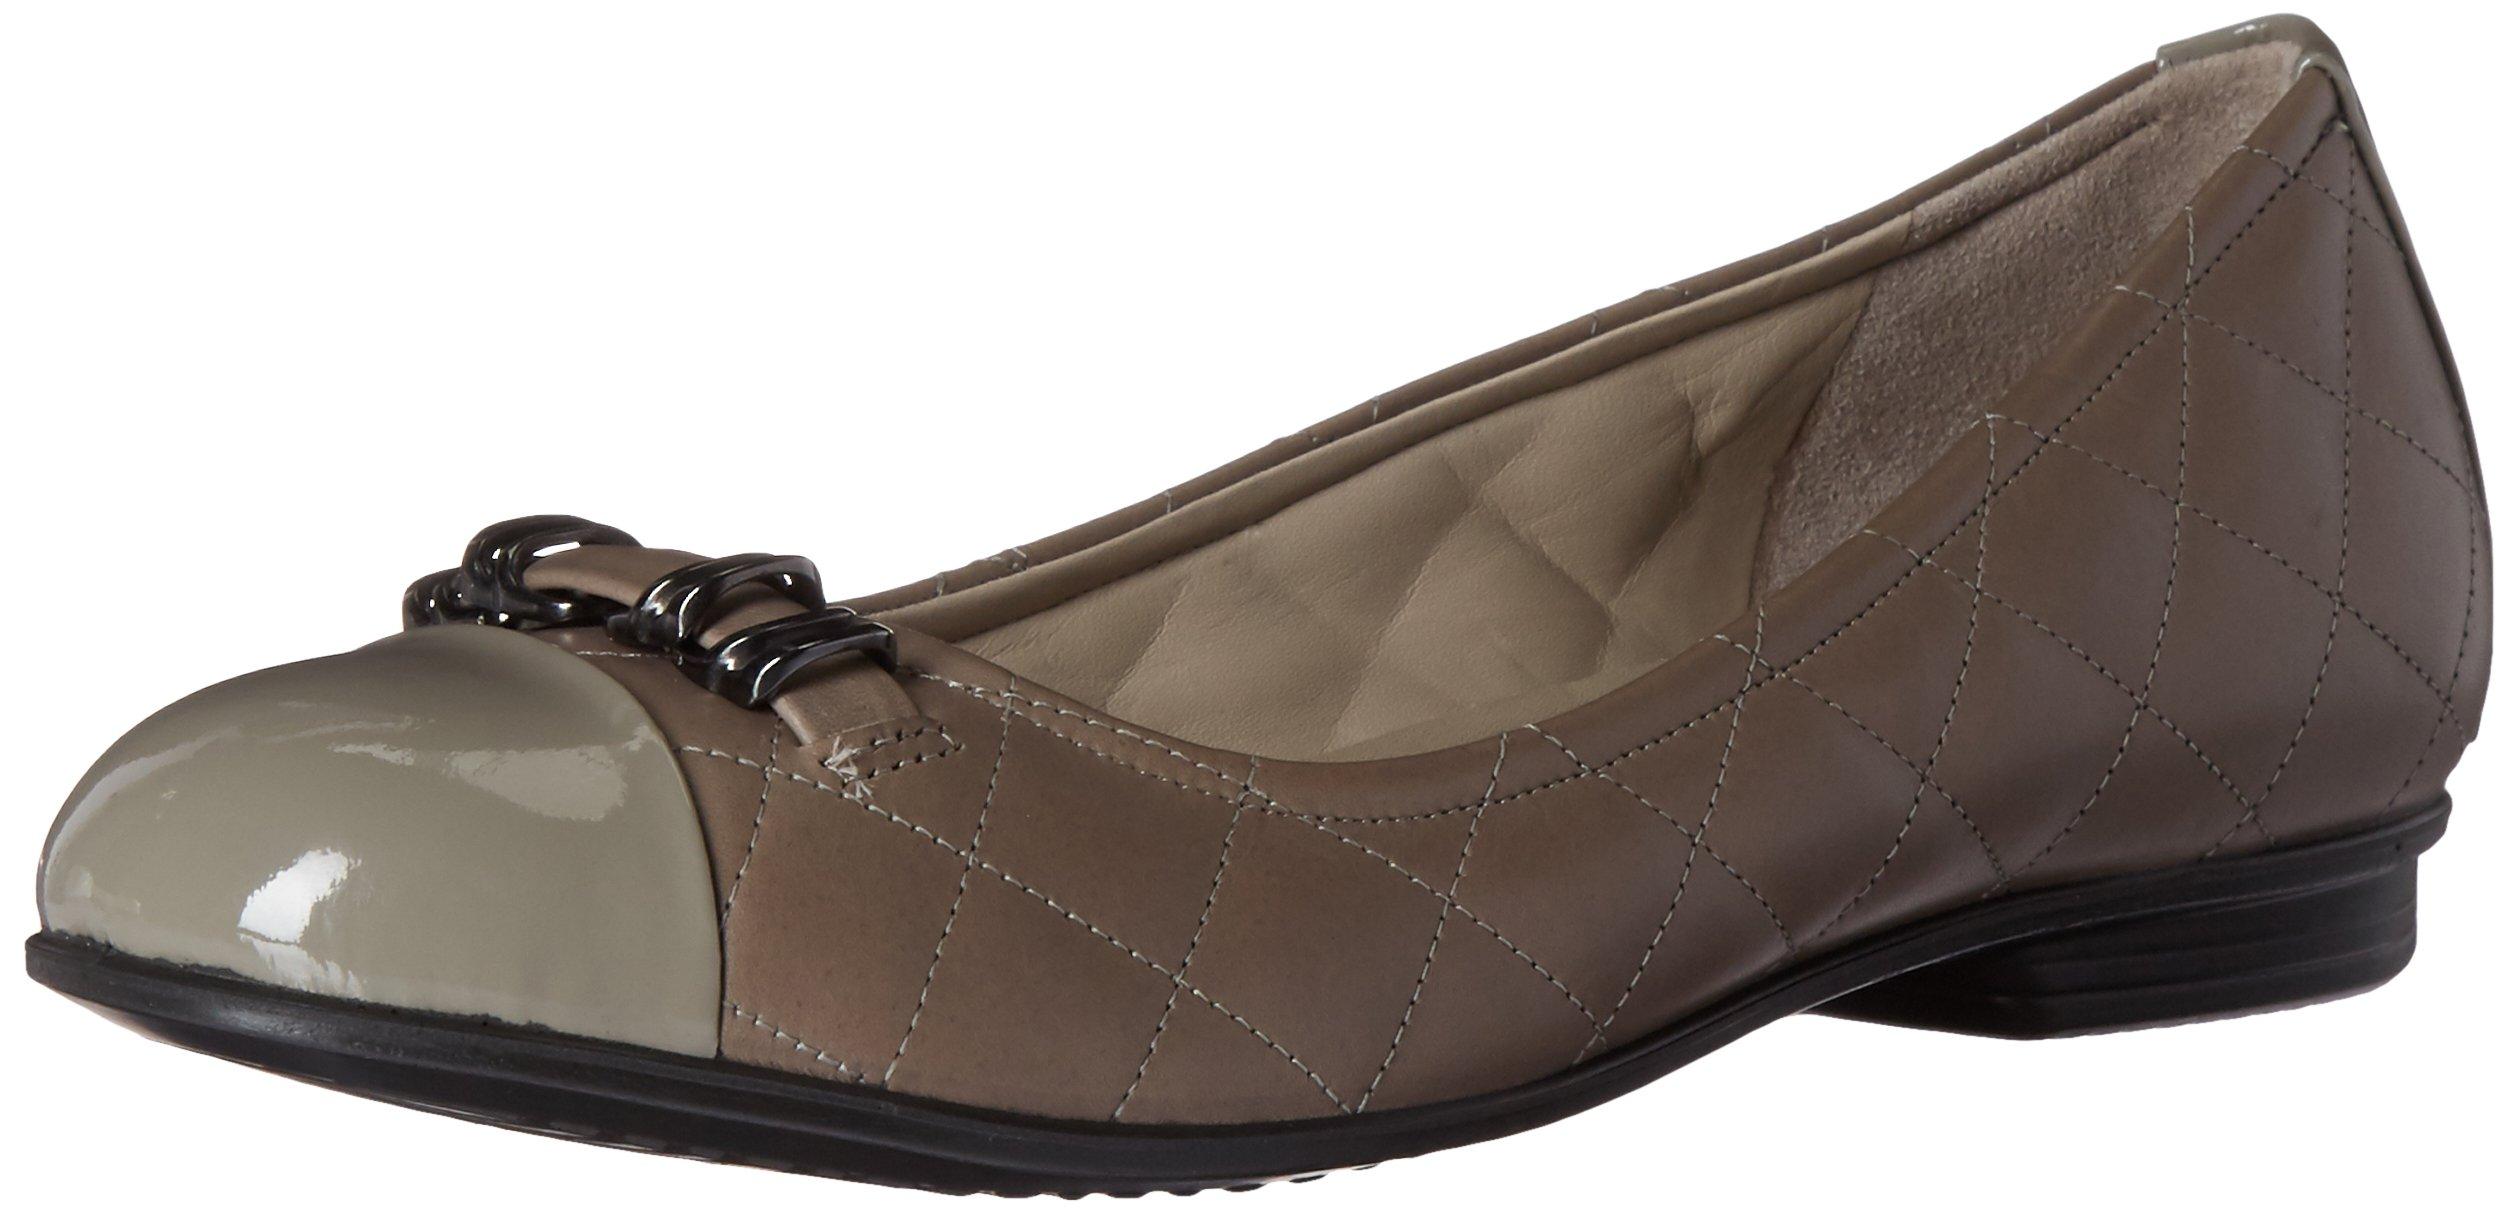 ECCO Footwear Womens Touch Quilted Ballerina Ballet Flat, Warm Grey/Stone, 41 EU/10-10.5 M US